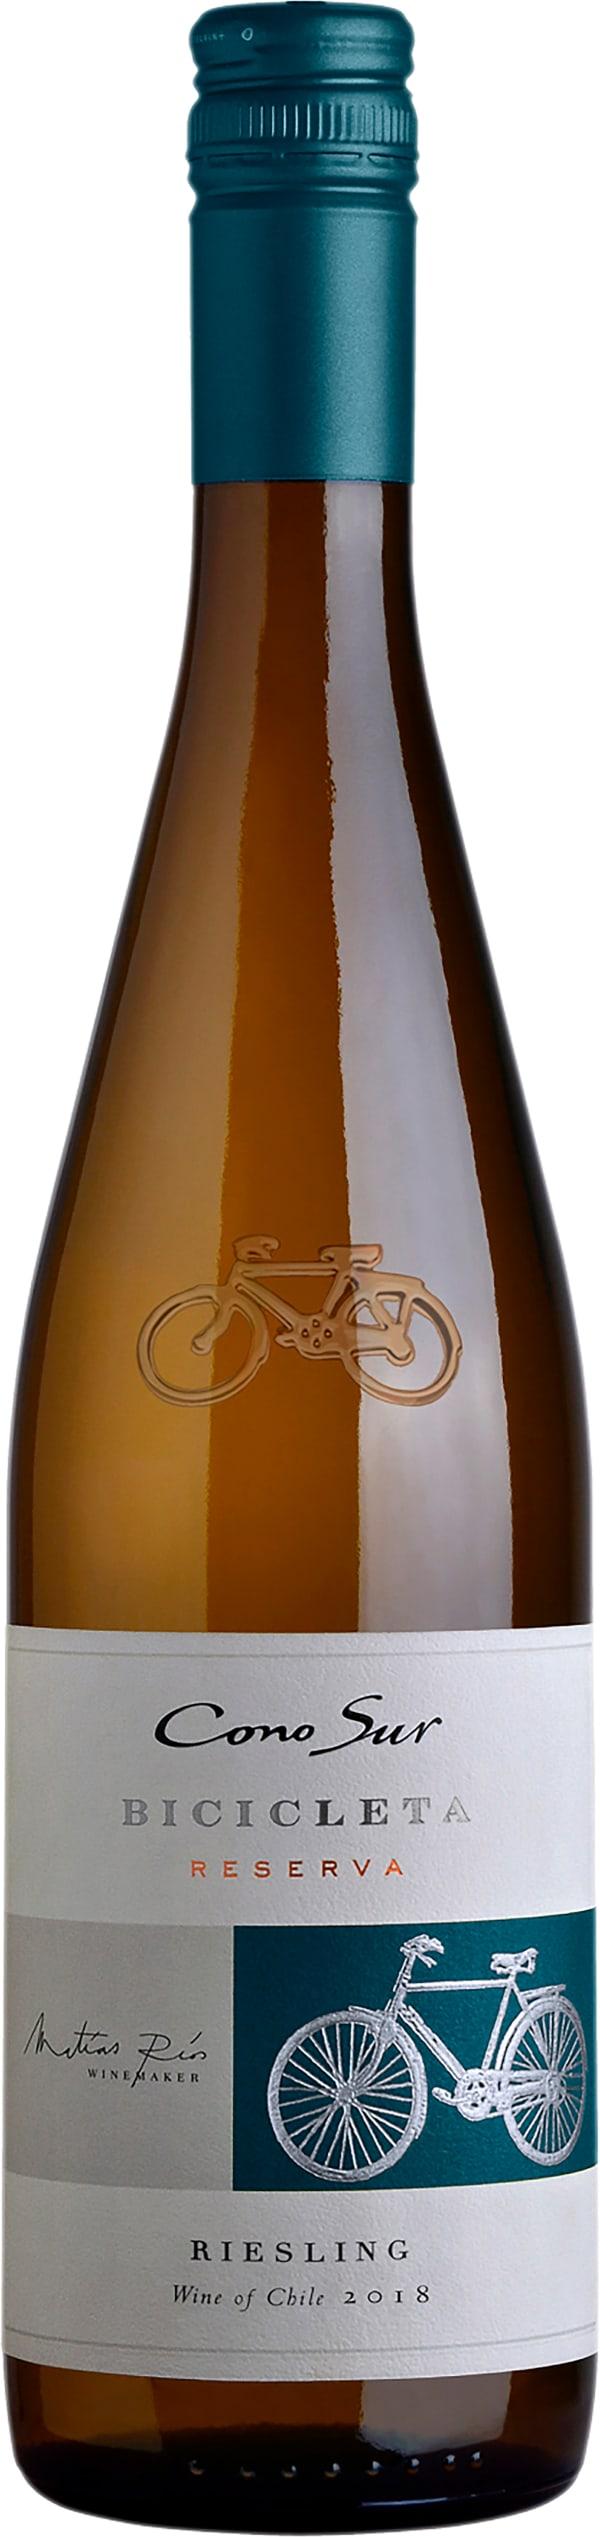 Cono Sur Bicicleta Riesling 2020